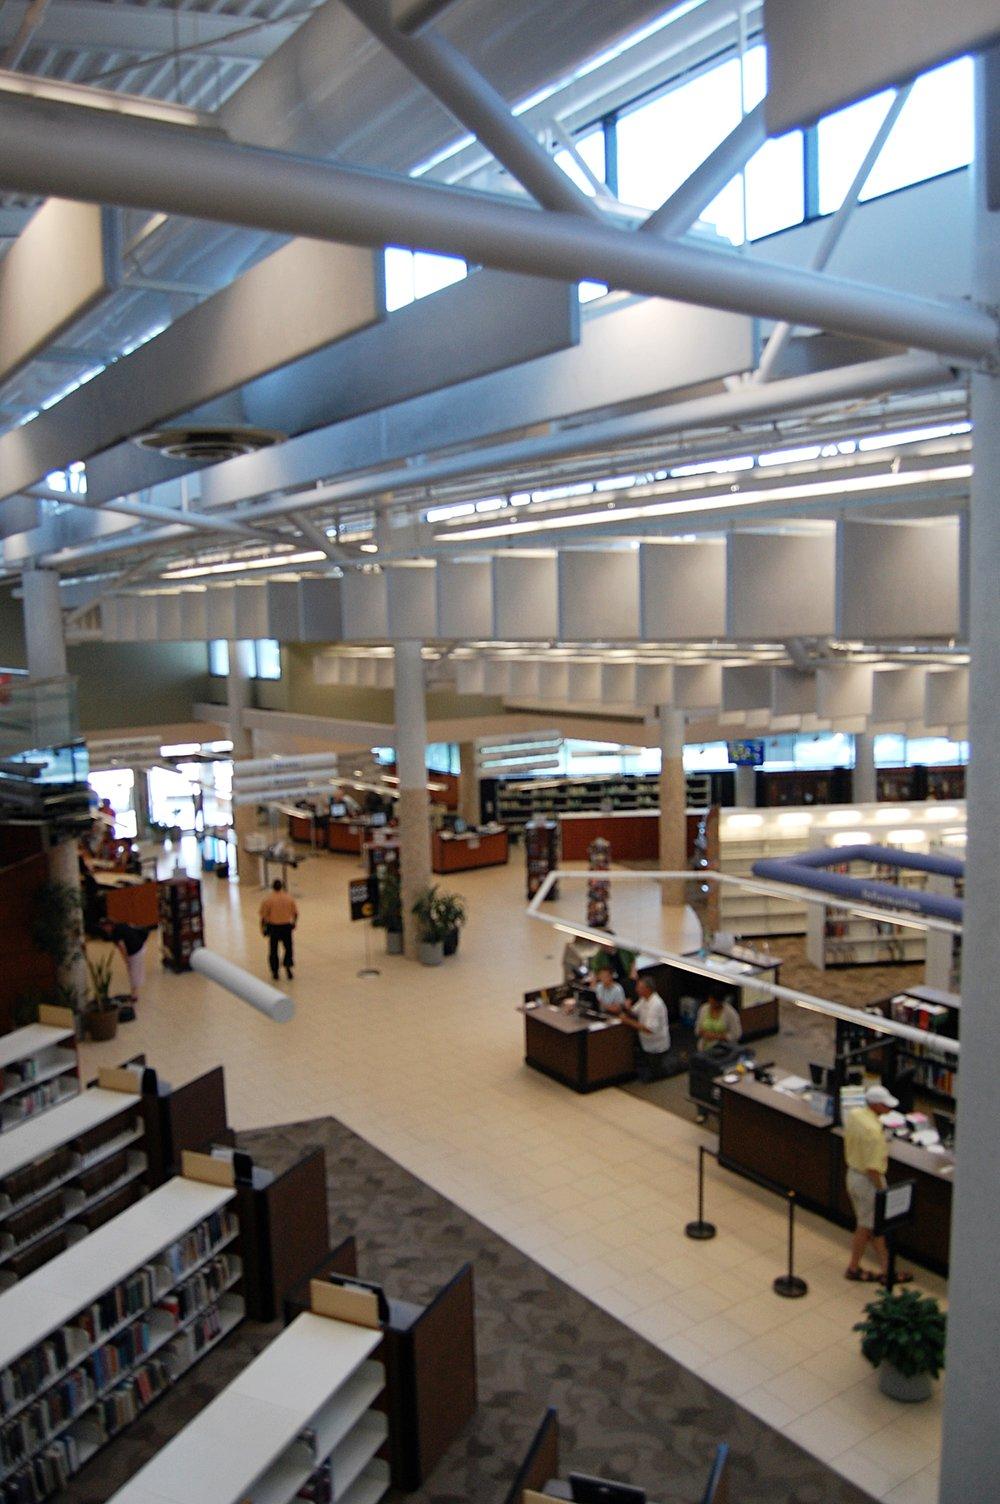 Meyera E. Oberndorf Central Library #daylighting#sustainability#sustainabledesign#energyefficency#passivesolar#LEED#renewableenerygy#VirginiaBeach